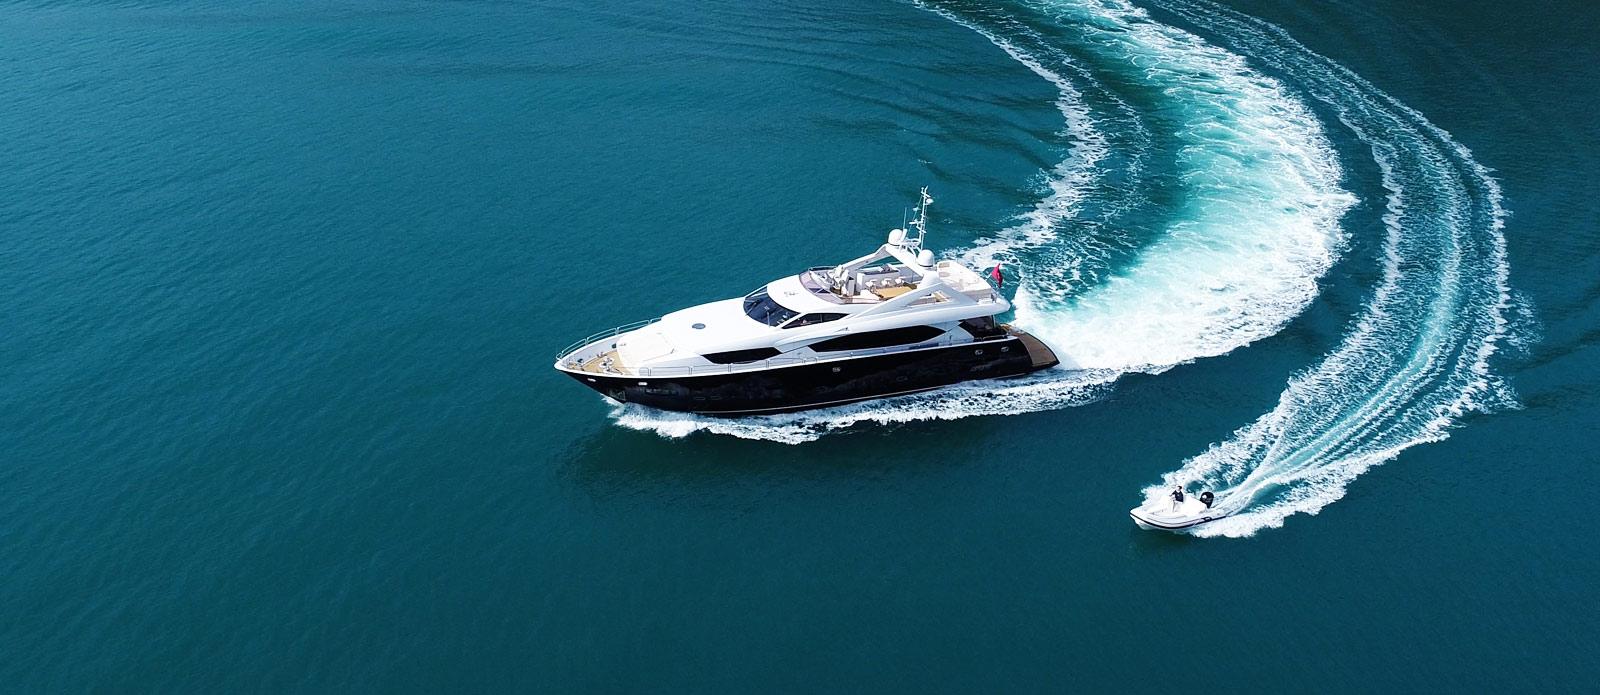 Sunseeker-30-Metre-Yacht-Coraysa-Cruising-with-Tender-Overhead